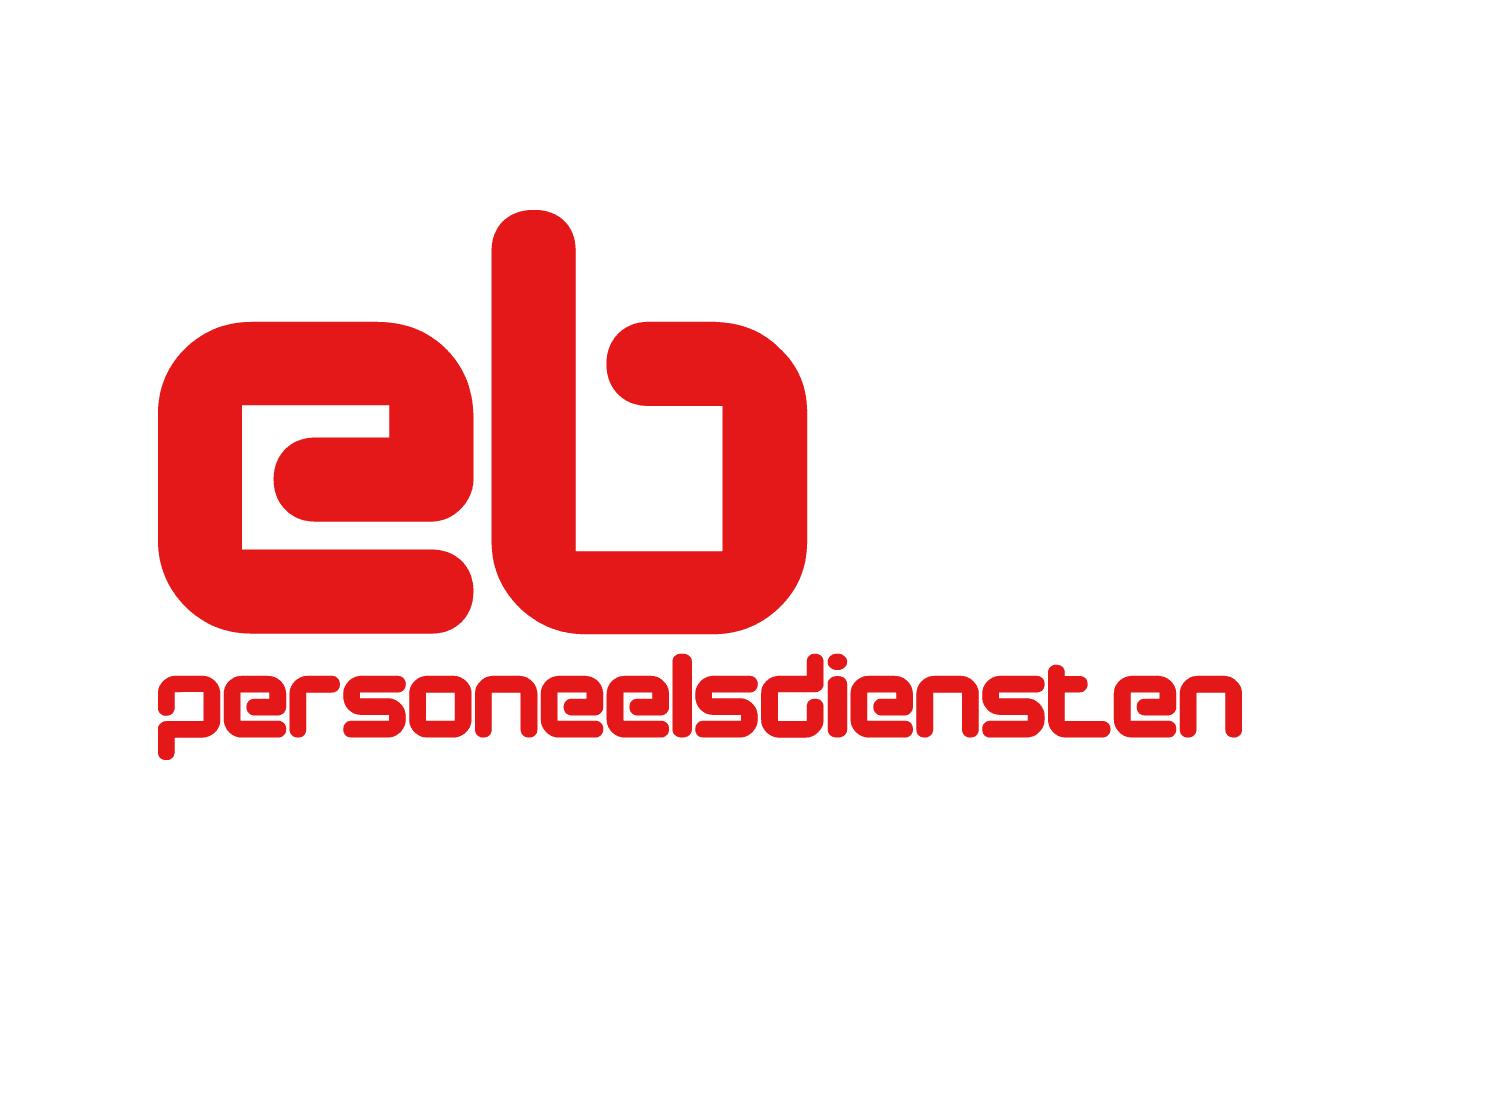 Eb Personeelsdiensten